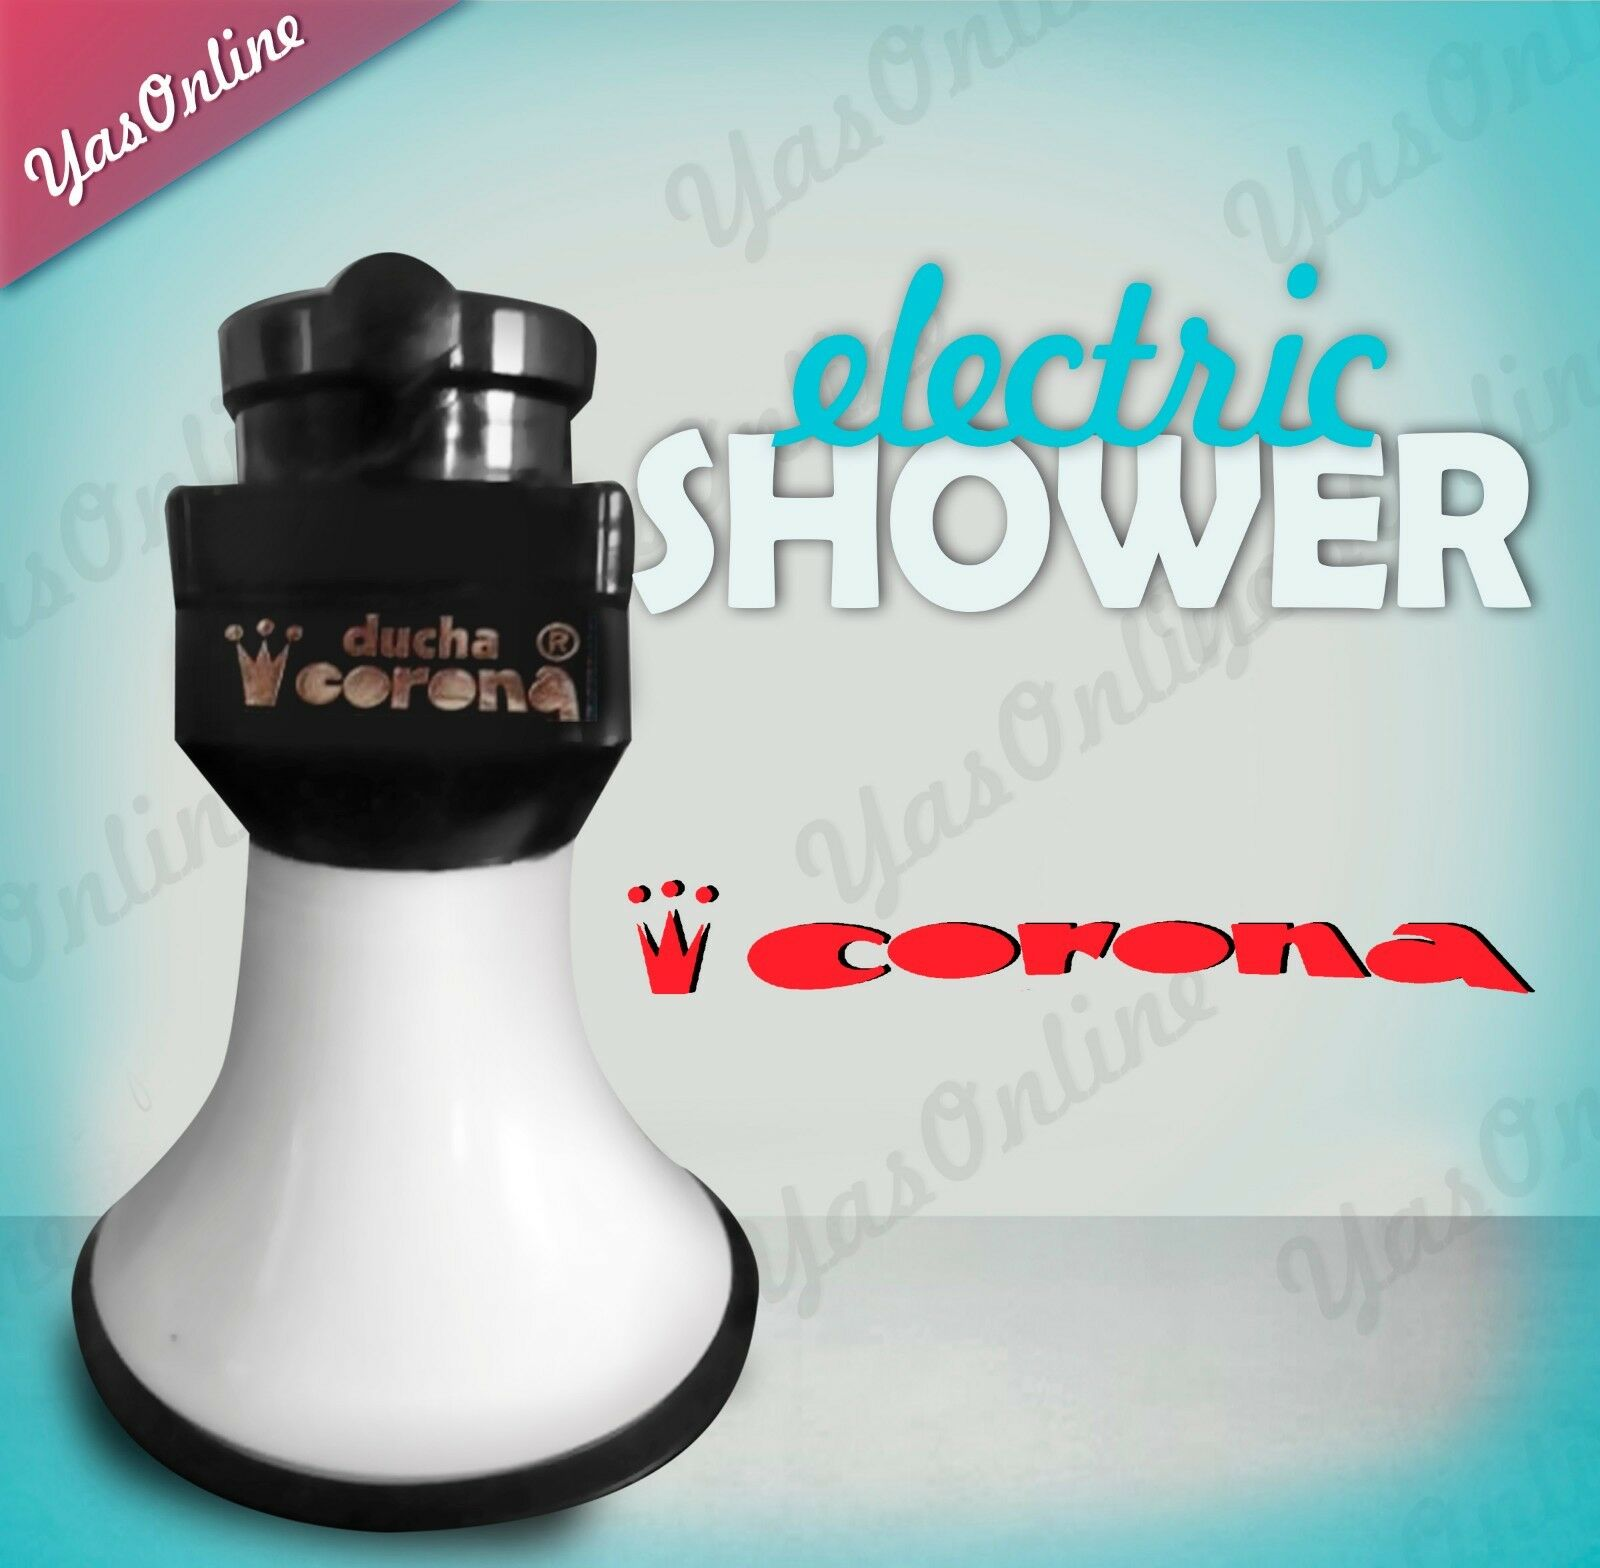 White Electric Shower Head Instant Hot Water Heater Ducha Corona Wiring An Amp Power 120v 4000watt Ebay